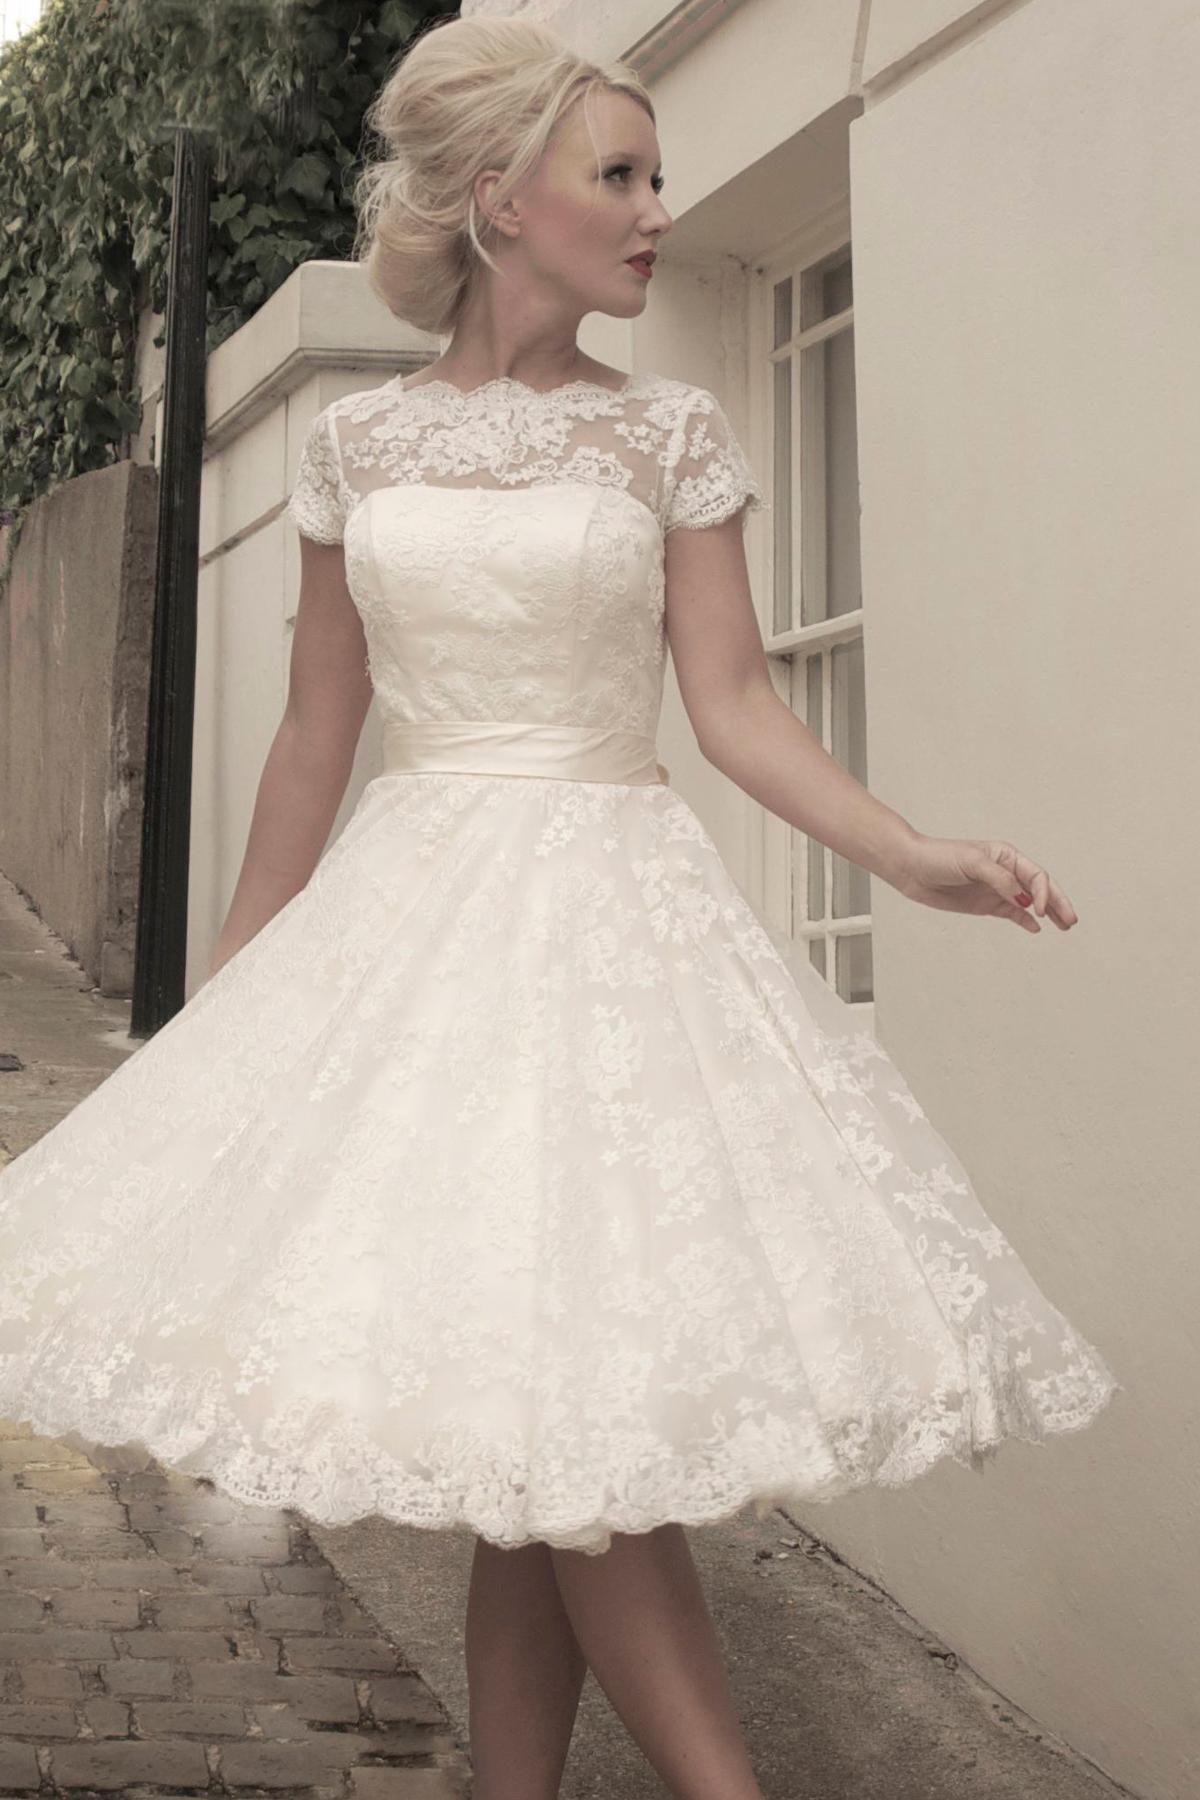 Cheap vintage style wedding dresses uk stores